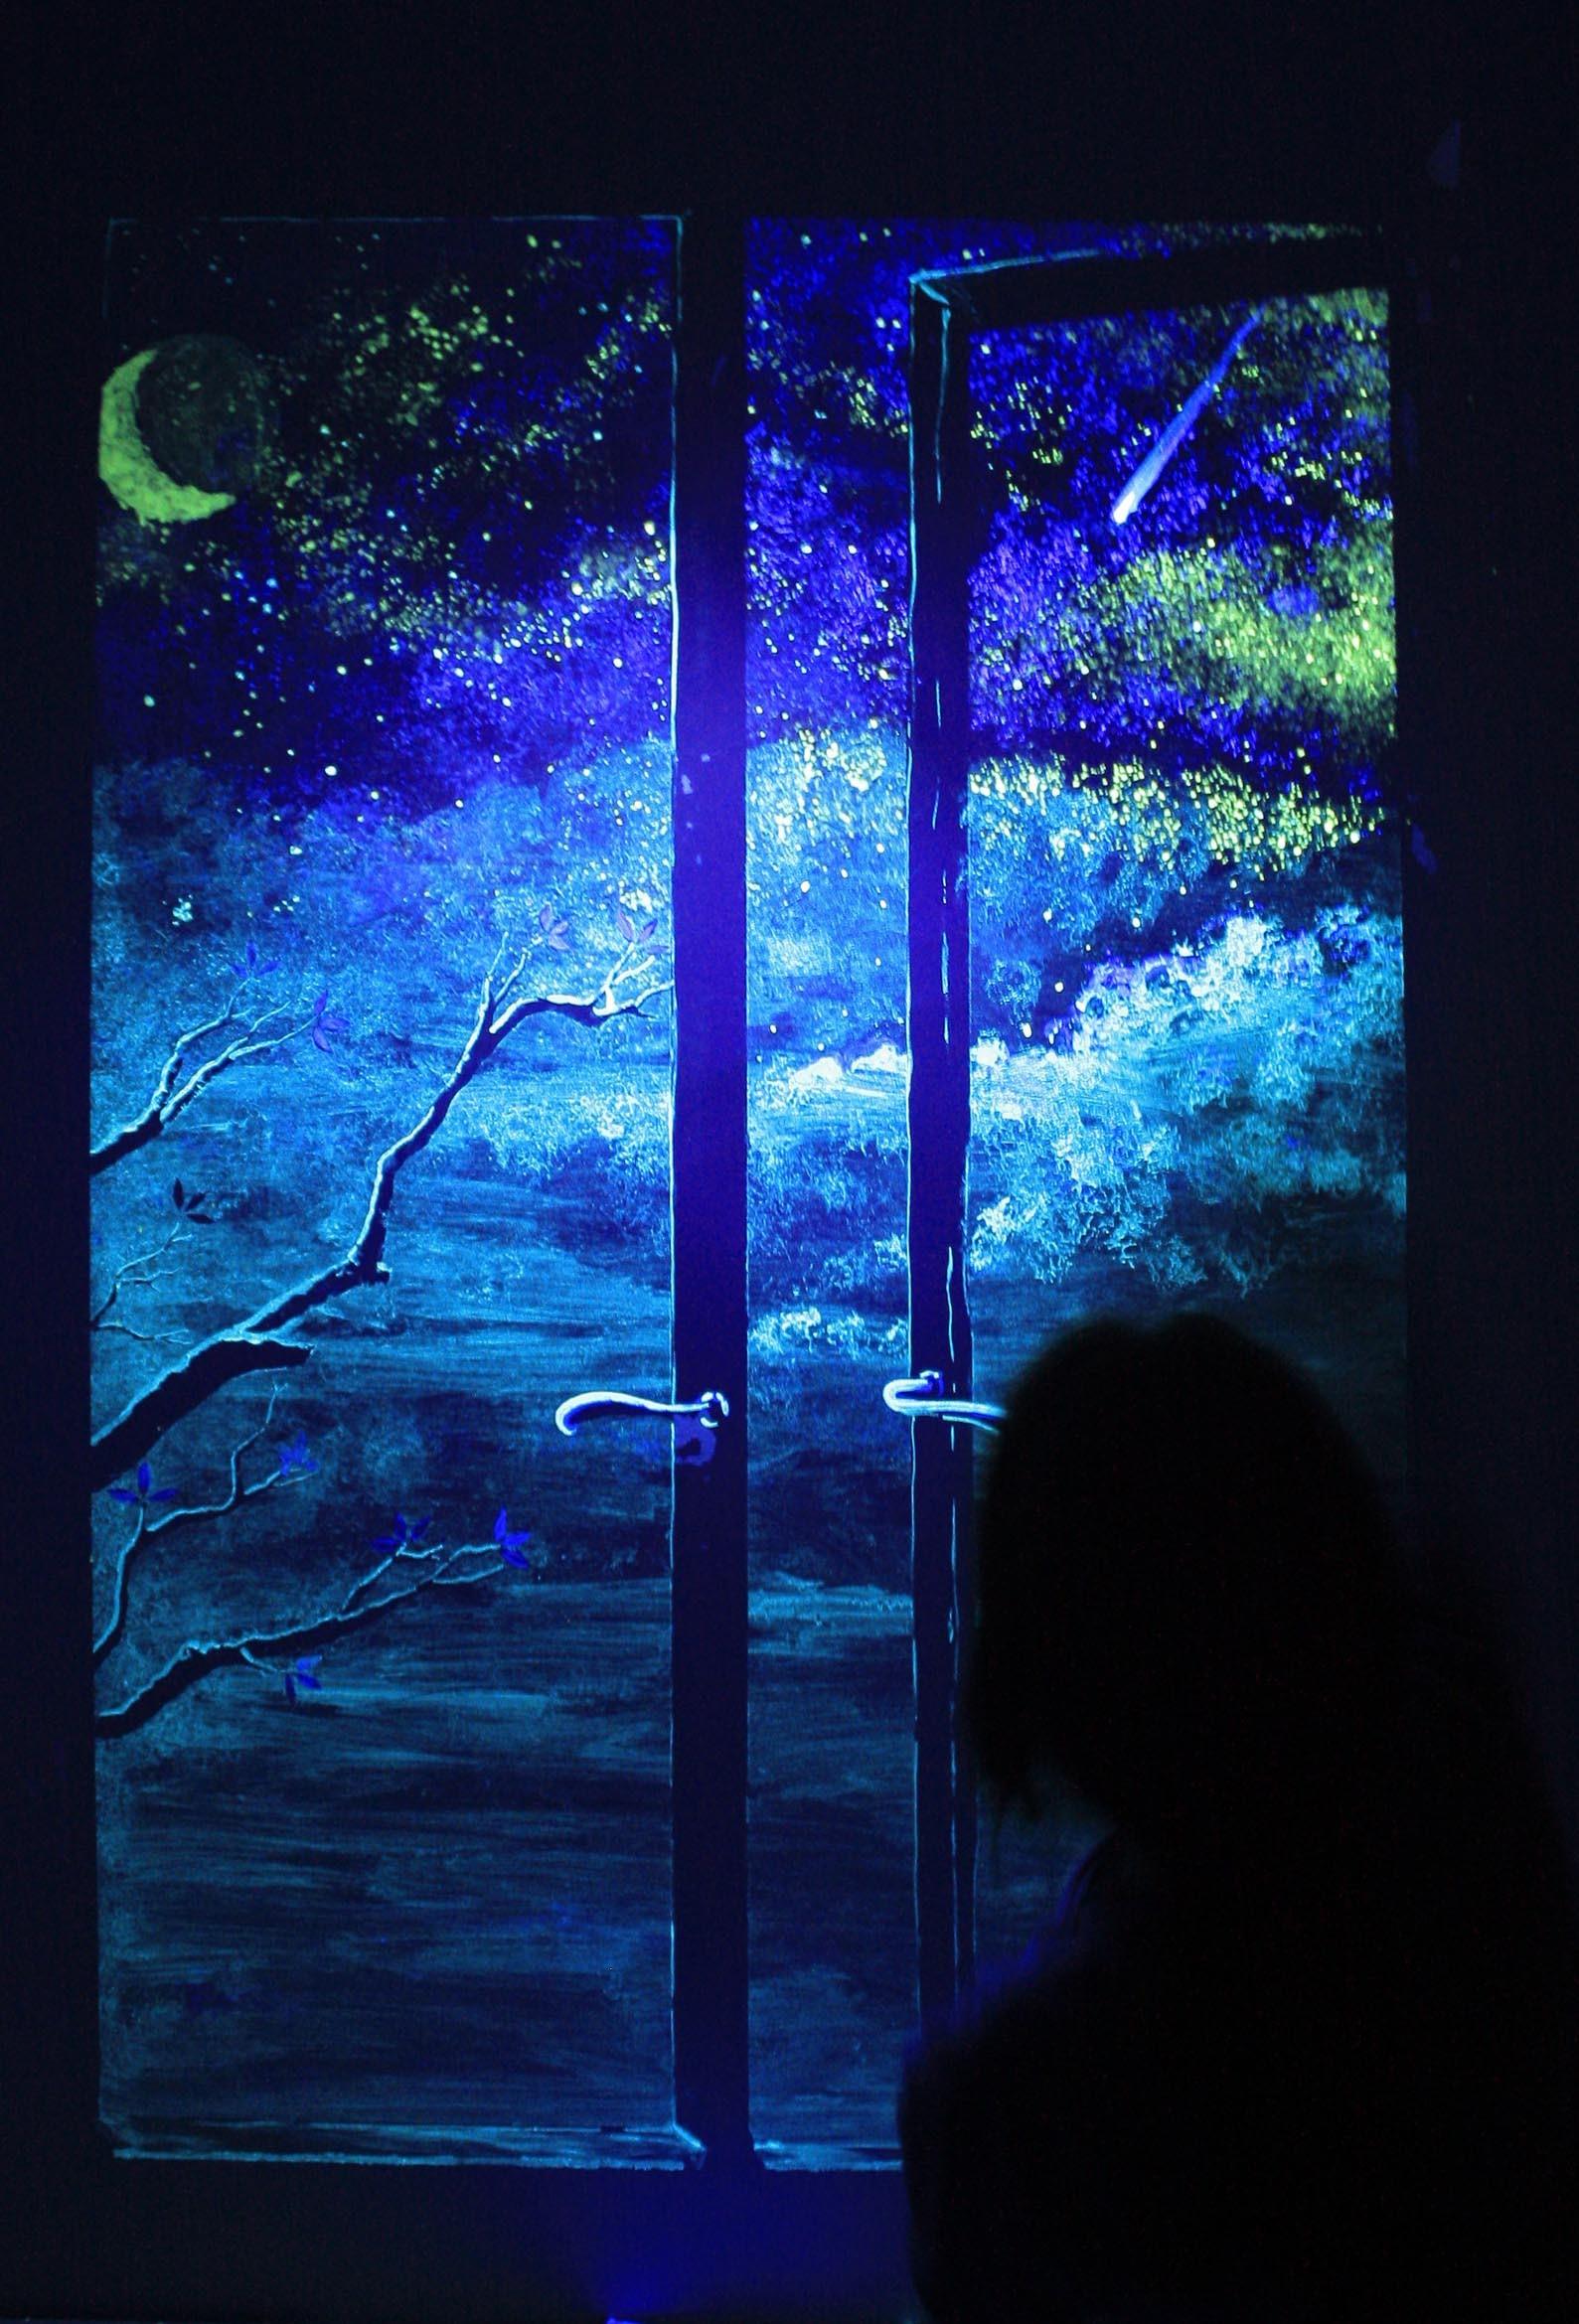 Glow in the Dark Wallpaper (67+ images)